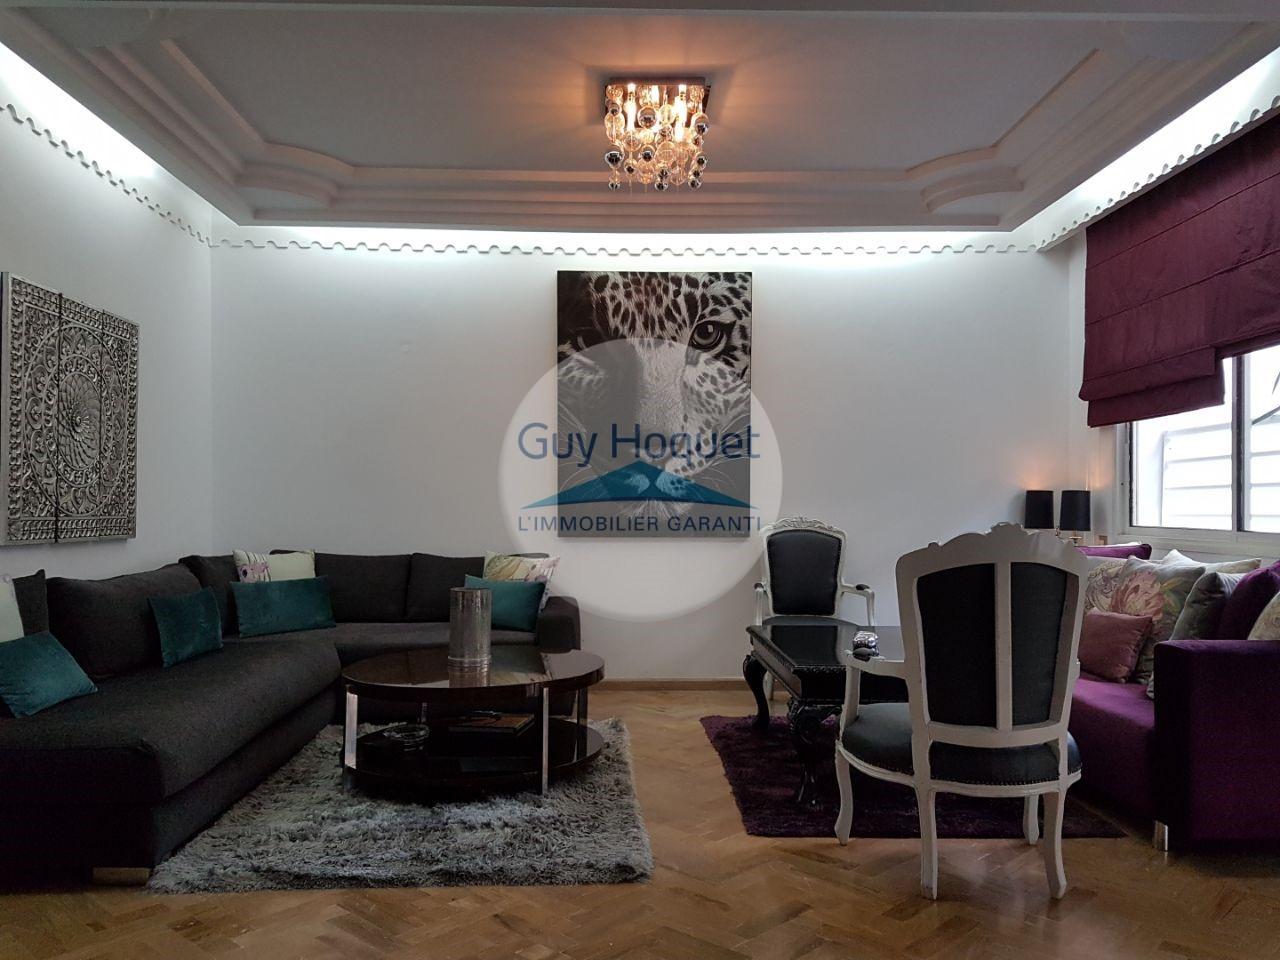 Vente <strong>Appartement</strong> Casablanca Racine <strong>173 m2</strong> - 3 chambre(s)